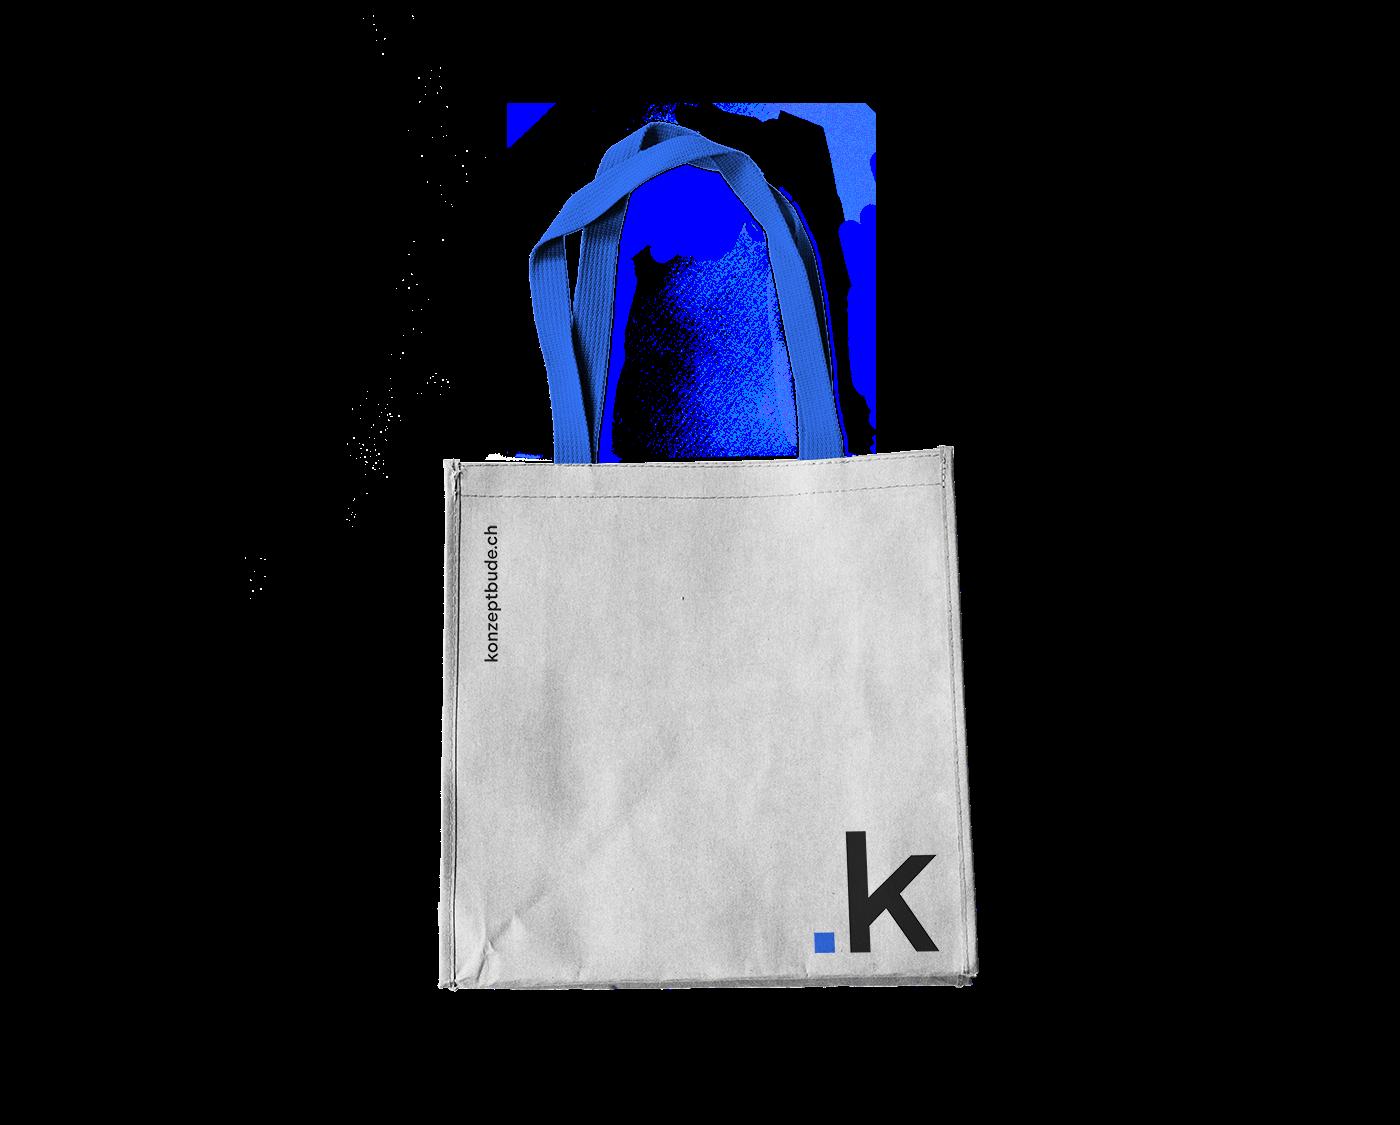 Konzeptbude, Branding, Schaffhausen, Format Studio